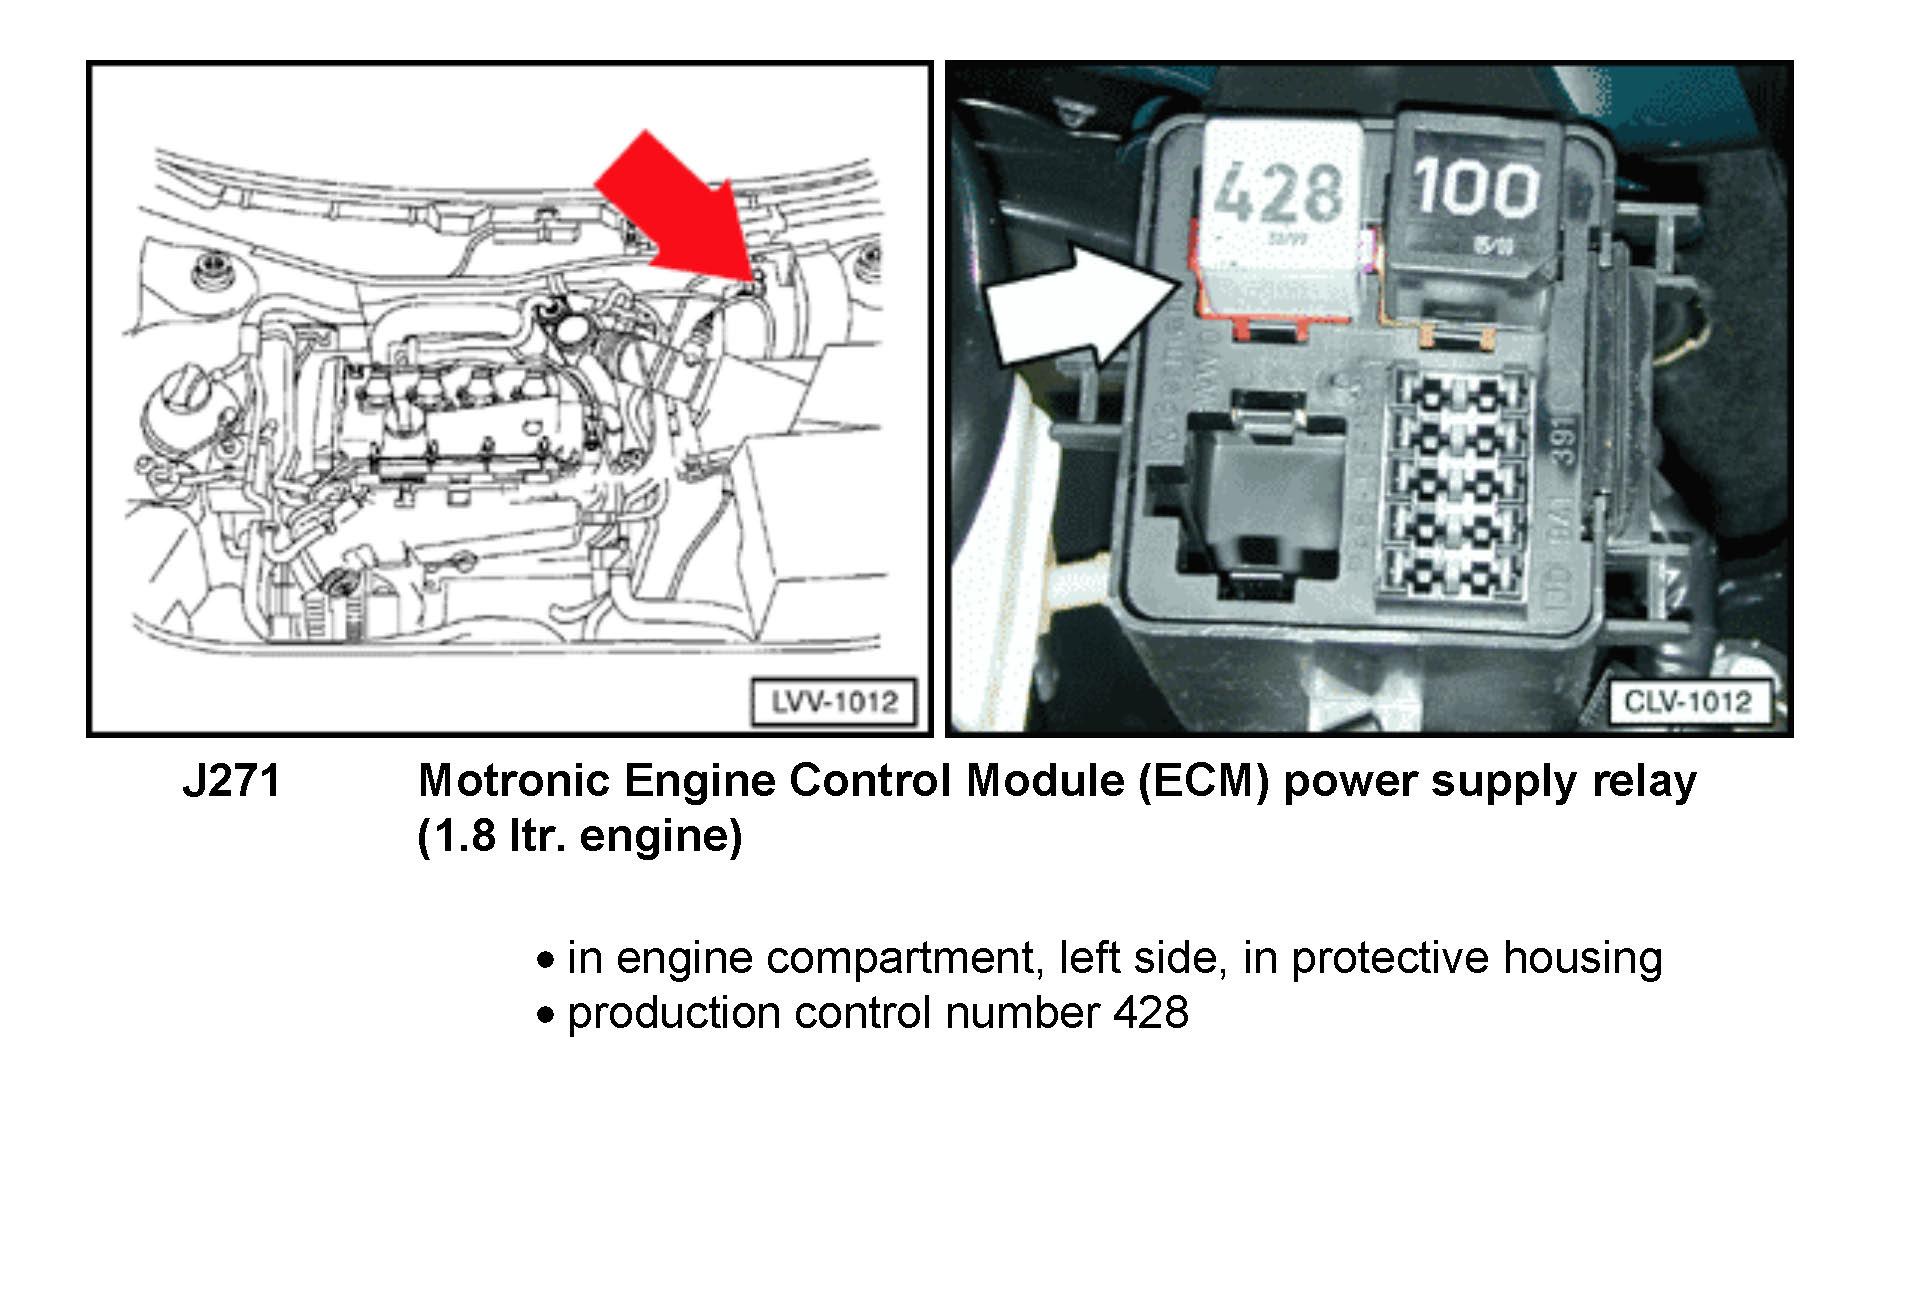 2004 Vw Jetta Fuel Pump Wiring Wire Data Schema 2001 Diagram Relay Diagrams U2022 Rh Autonomia Co 18t